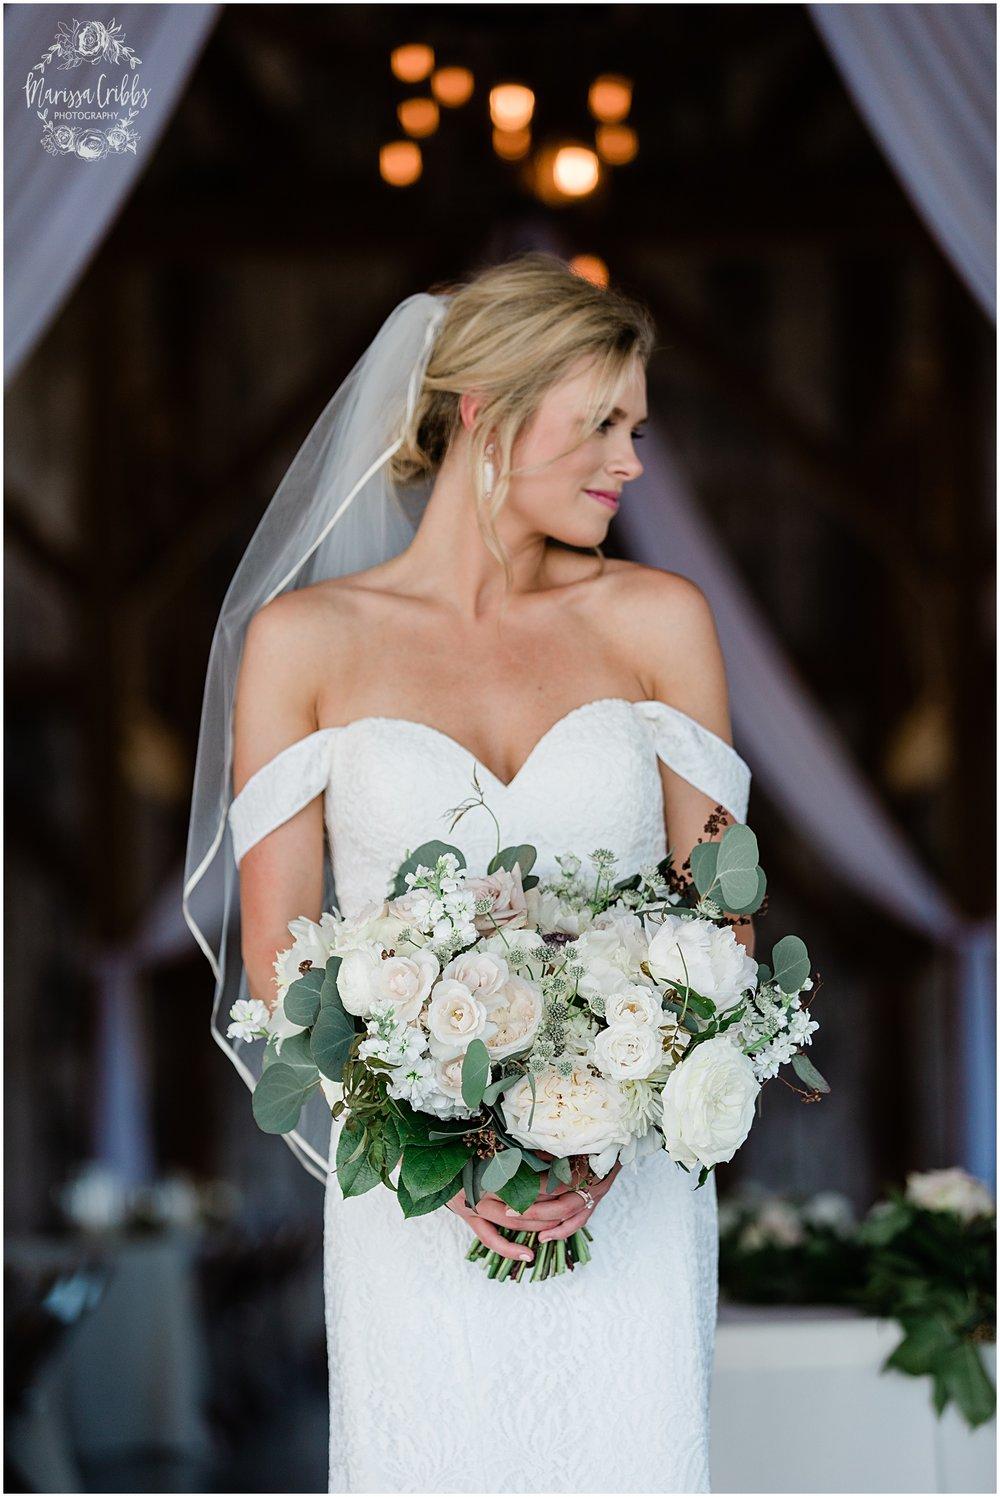 RHODES WEDDING | WESTON RED BARN FARM | MARISSA CRIBBS PHOTOGRAPHY_5252.jpg